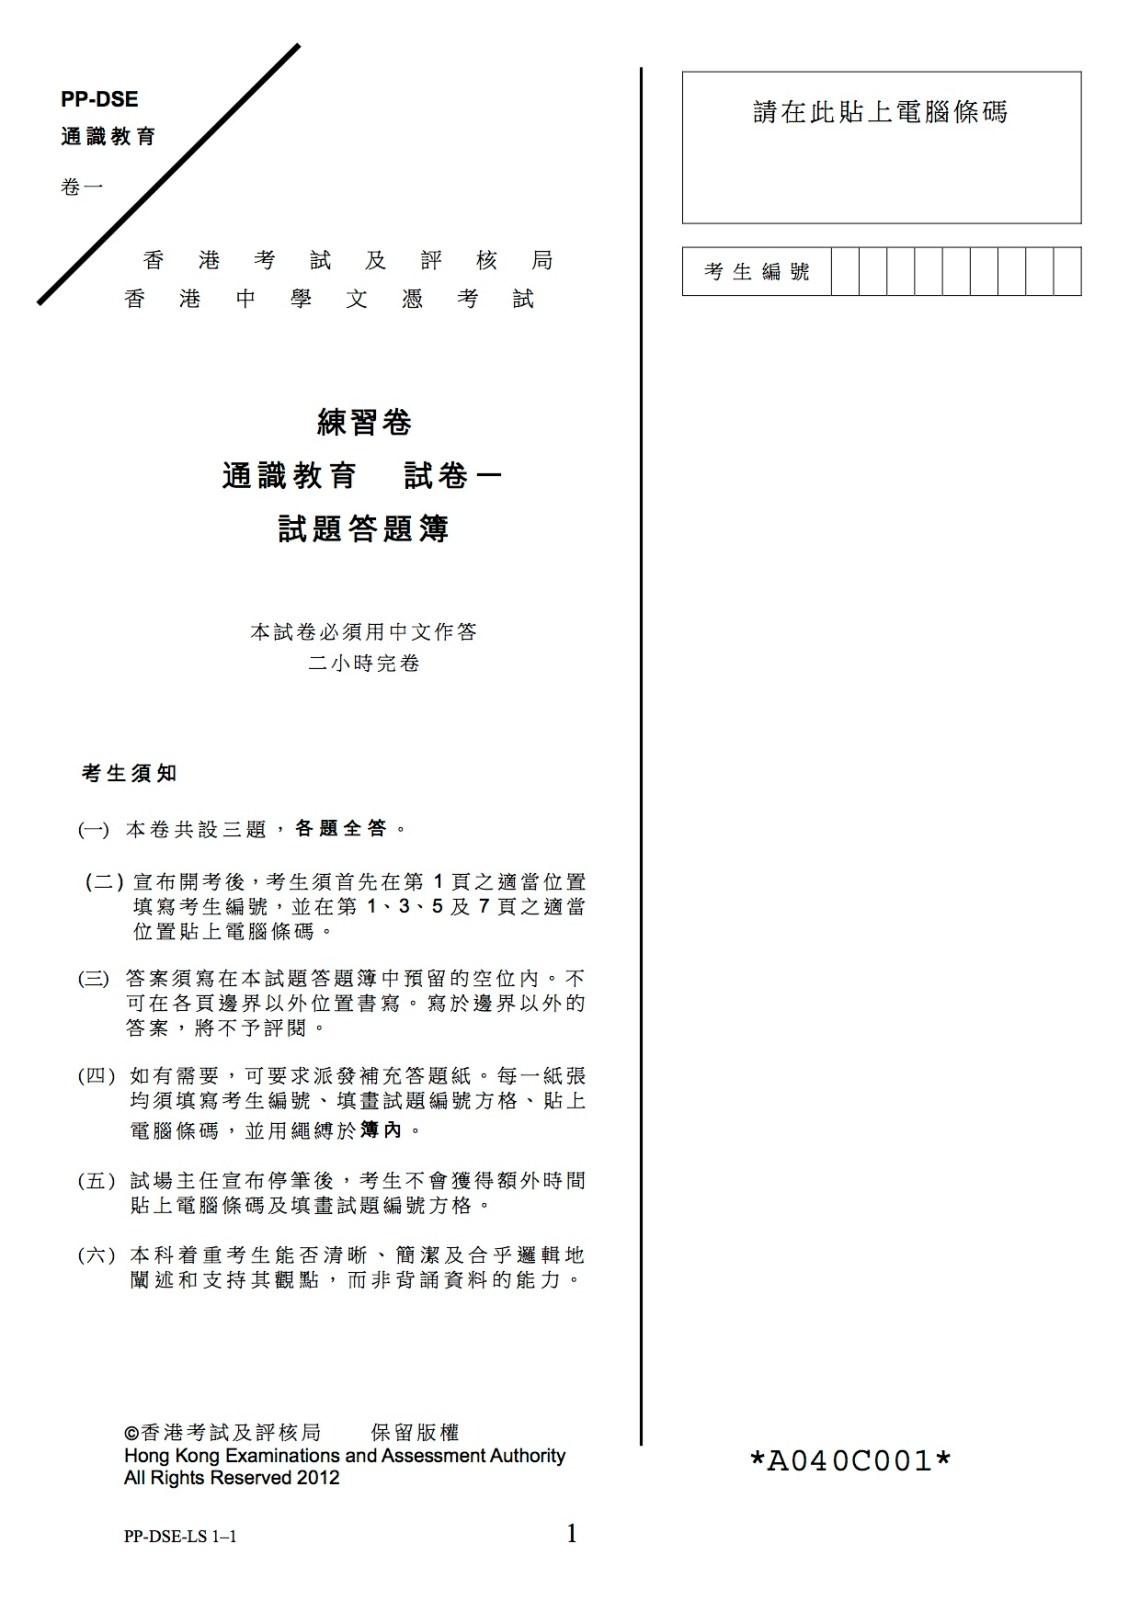 [2012DSE] 通識教育 Practice paper 練習卷 – 公開試資源庫